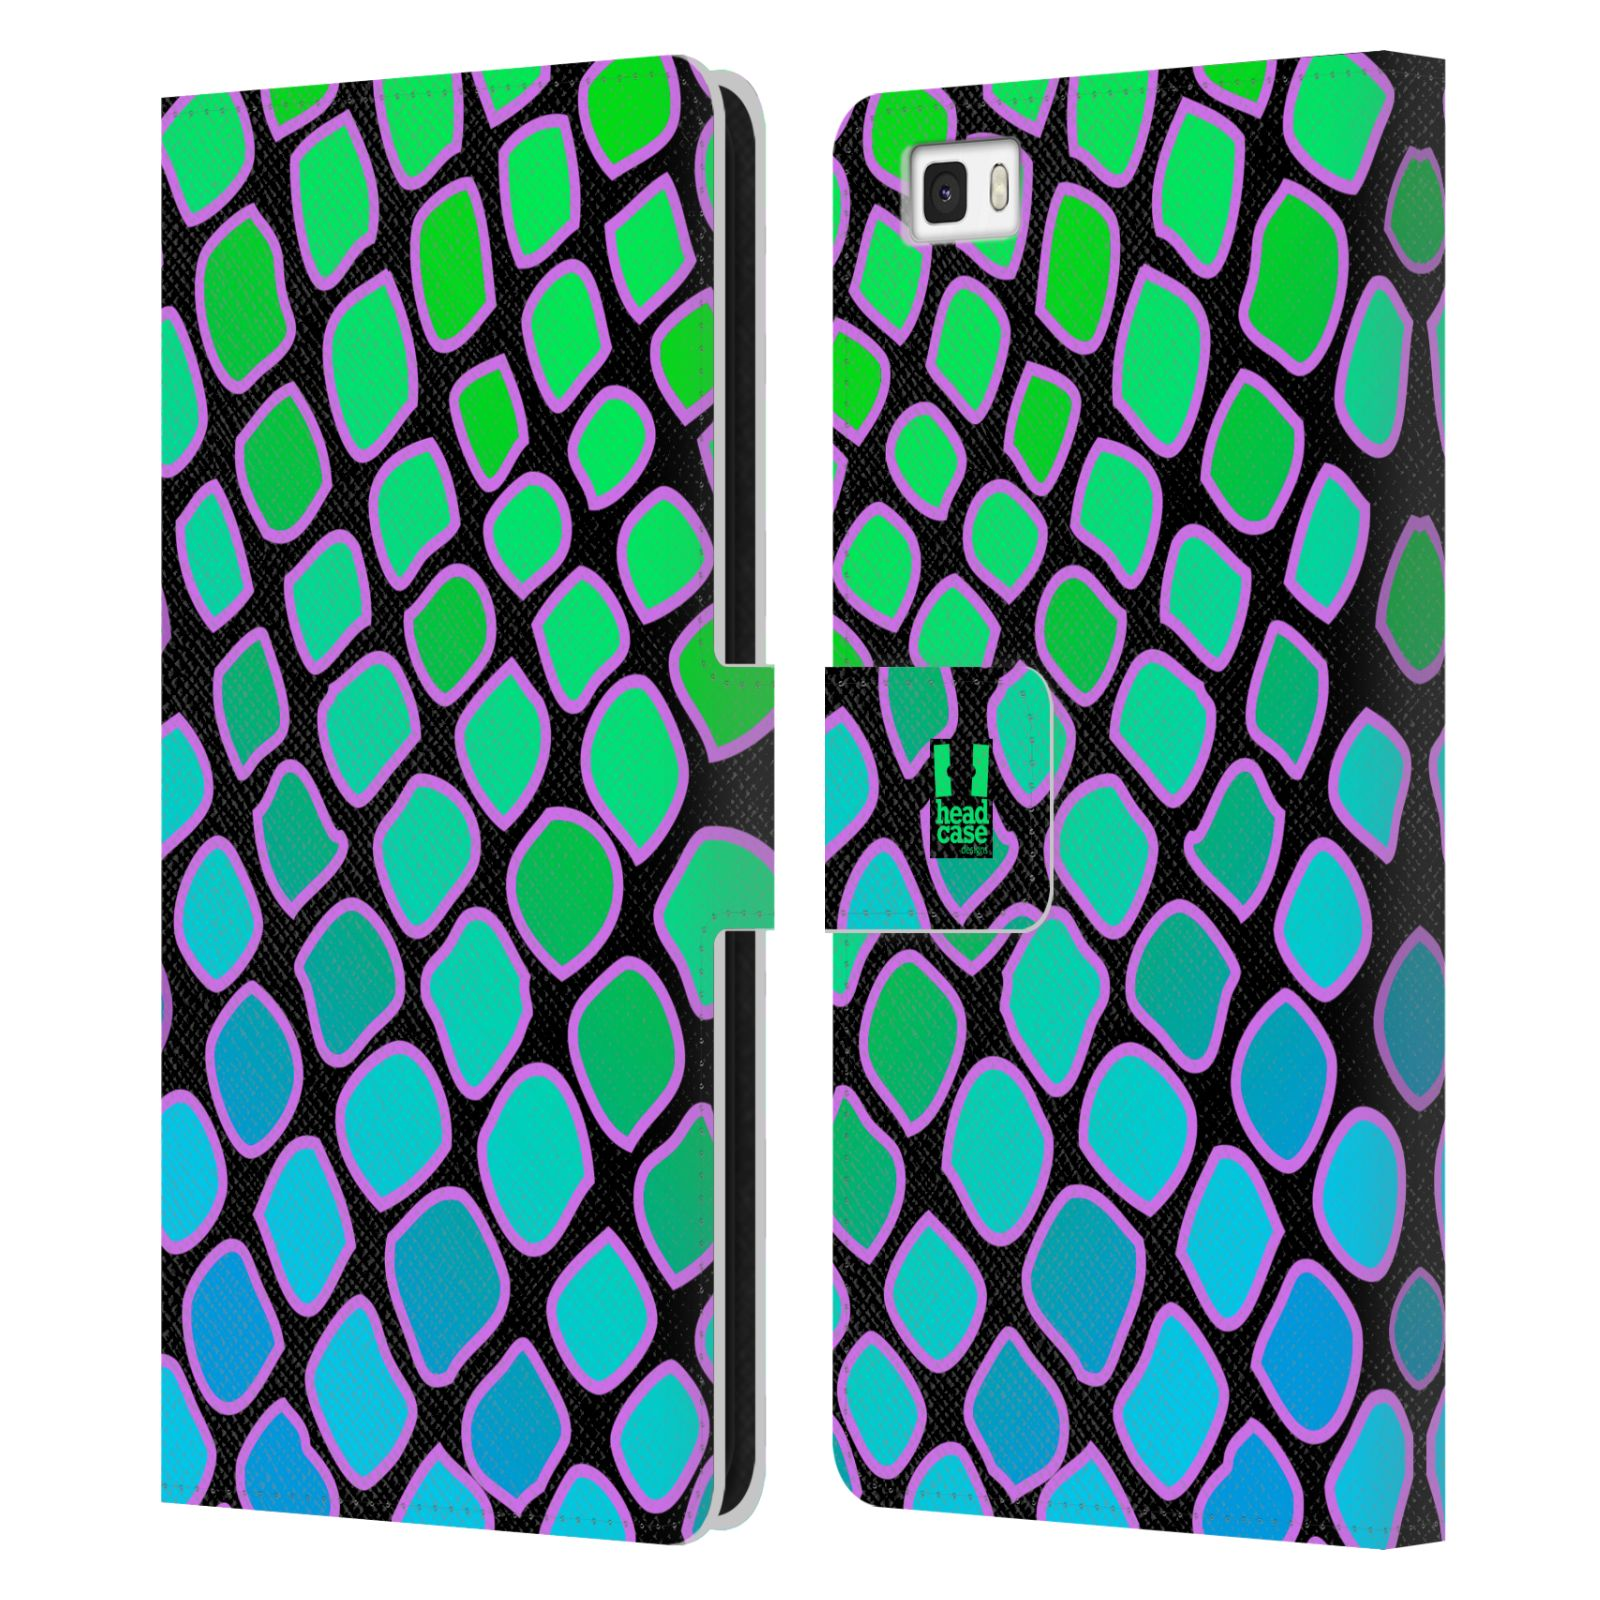 HEAD CASE Flipové pouzdro pro mobil Huawei P8 LITE Zvířecí barevné vzory vodní had modrá a zelená barva AQUA